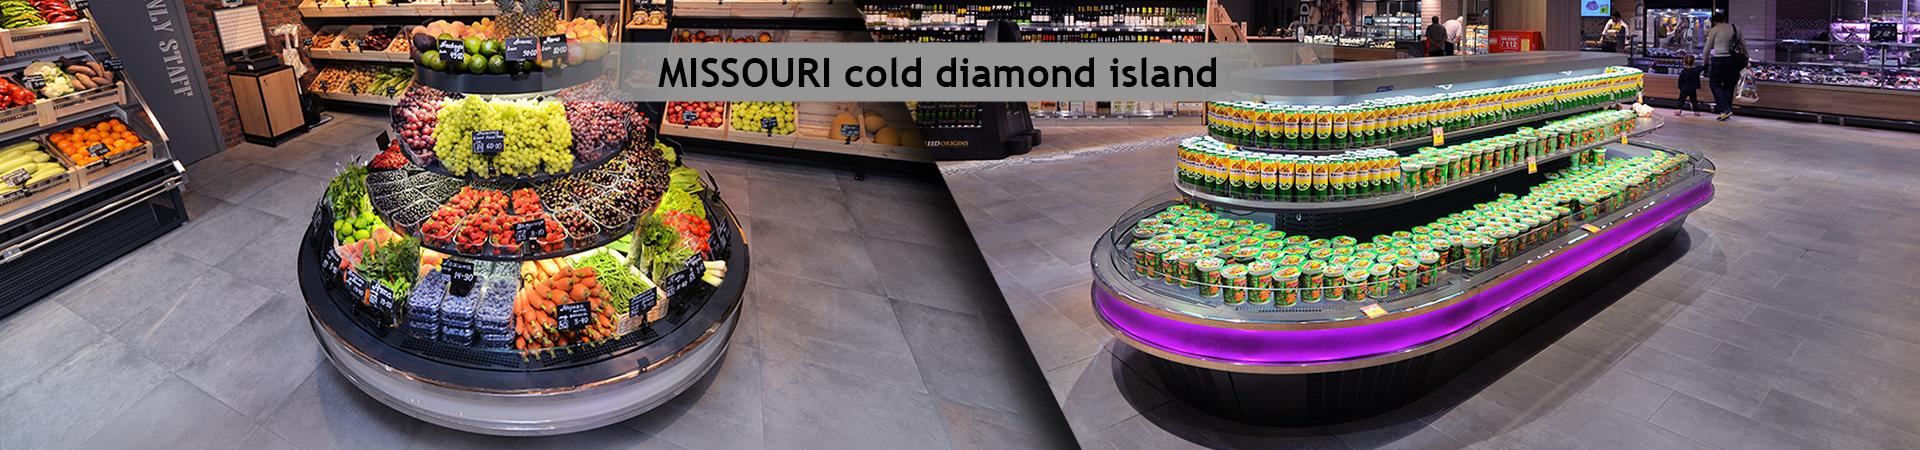 Вітрини Missouri cold diamond island